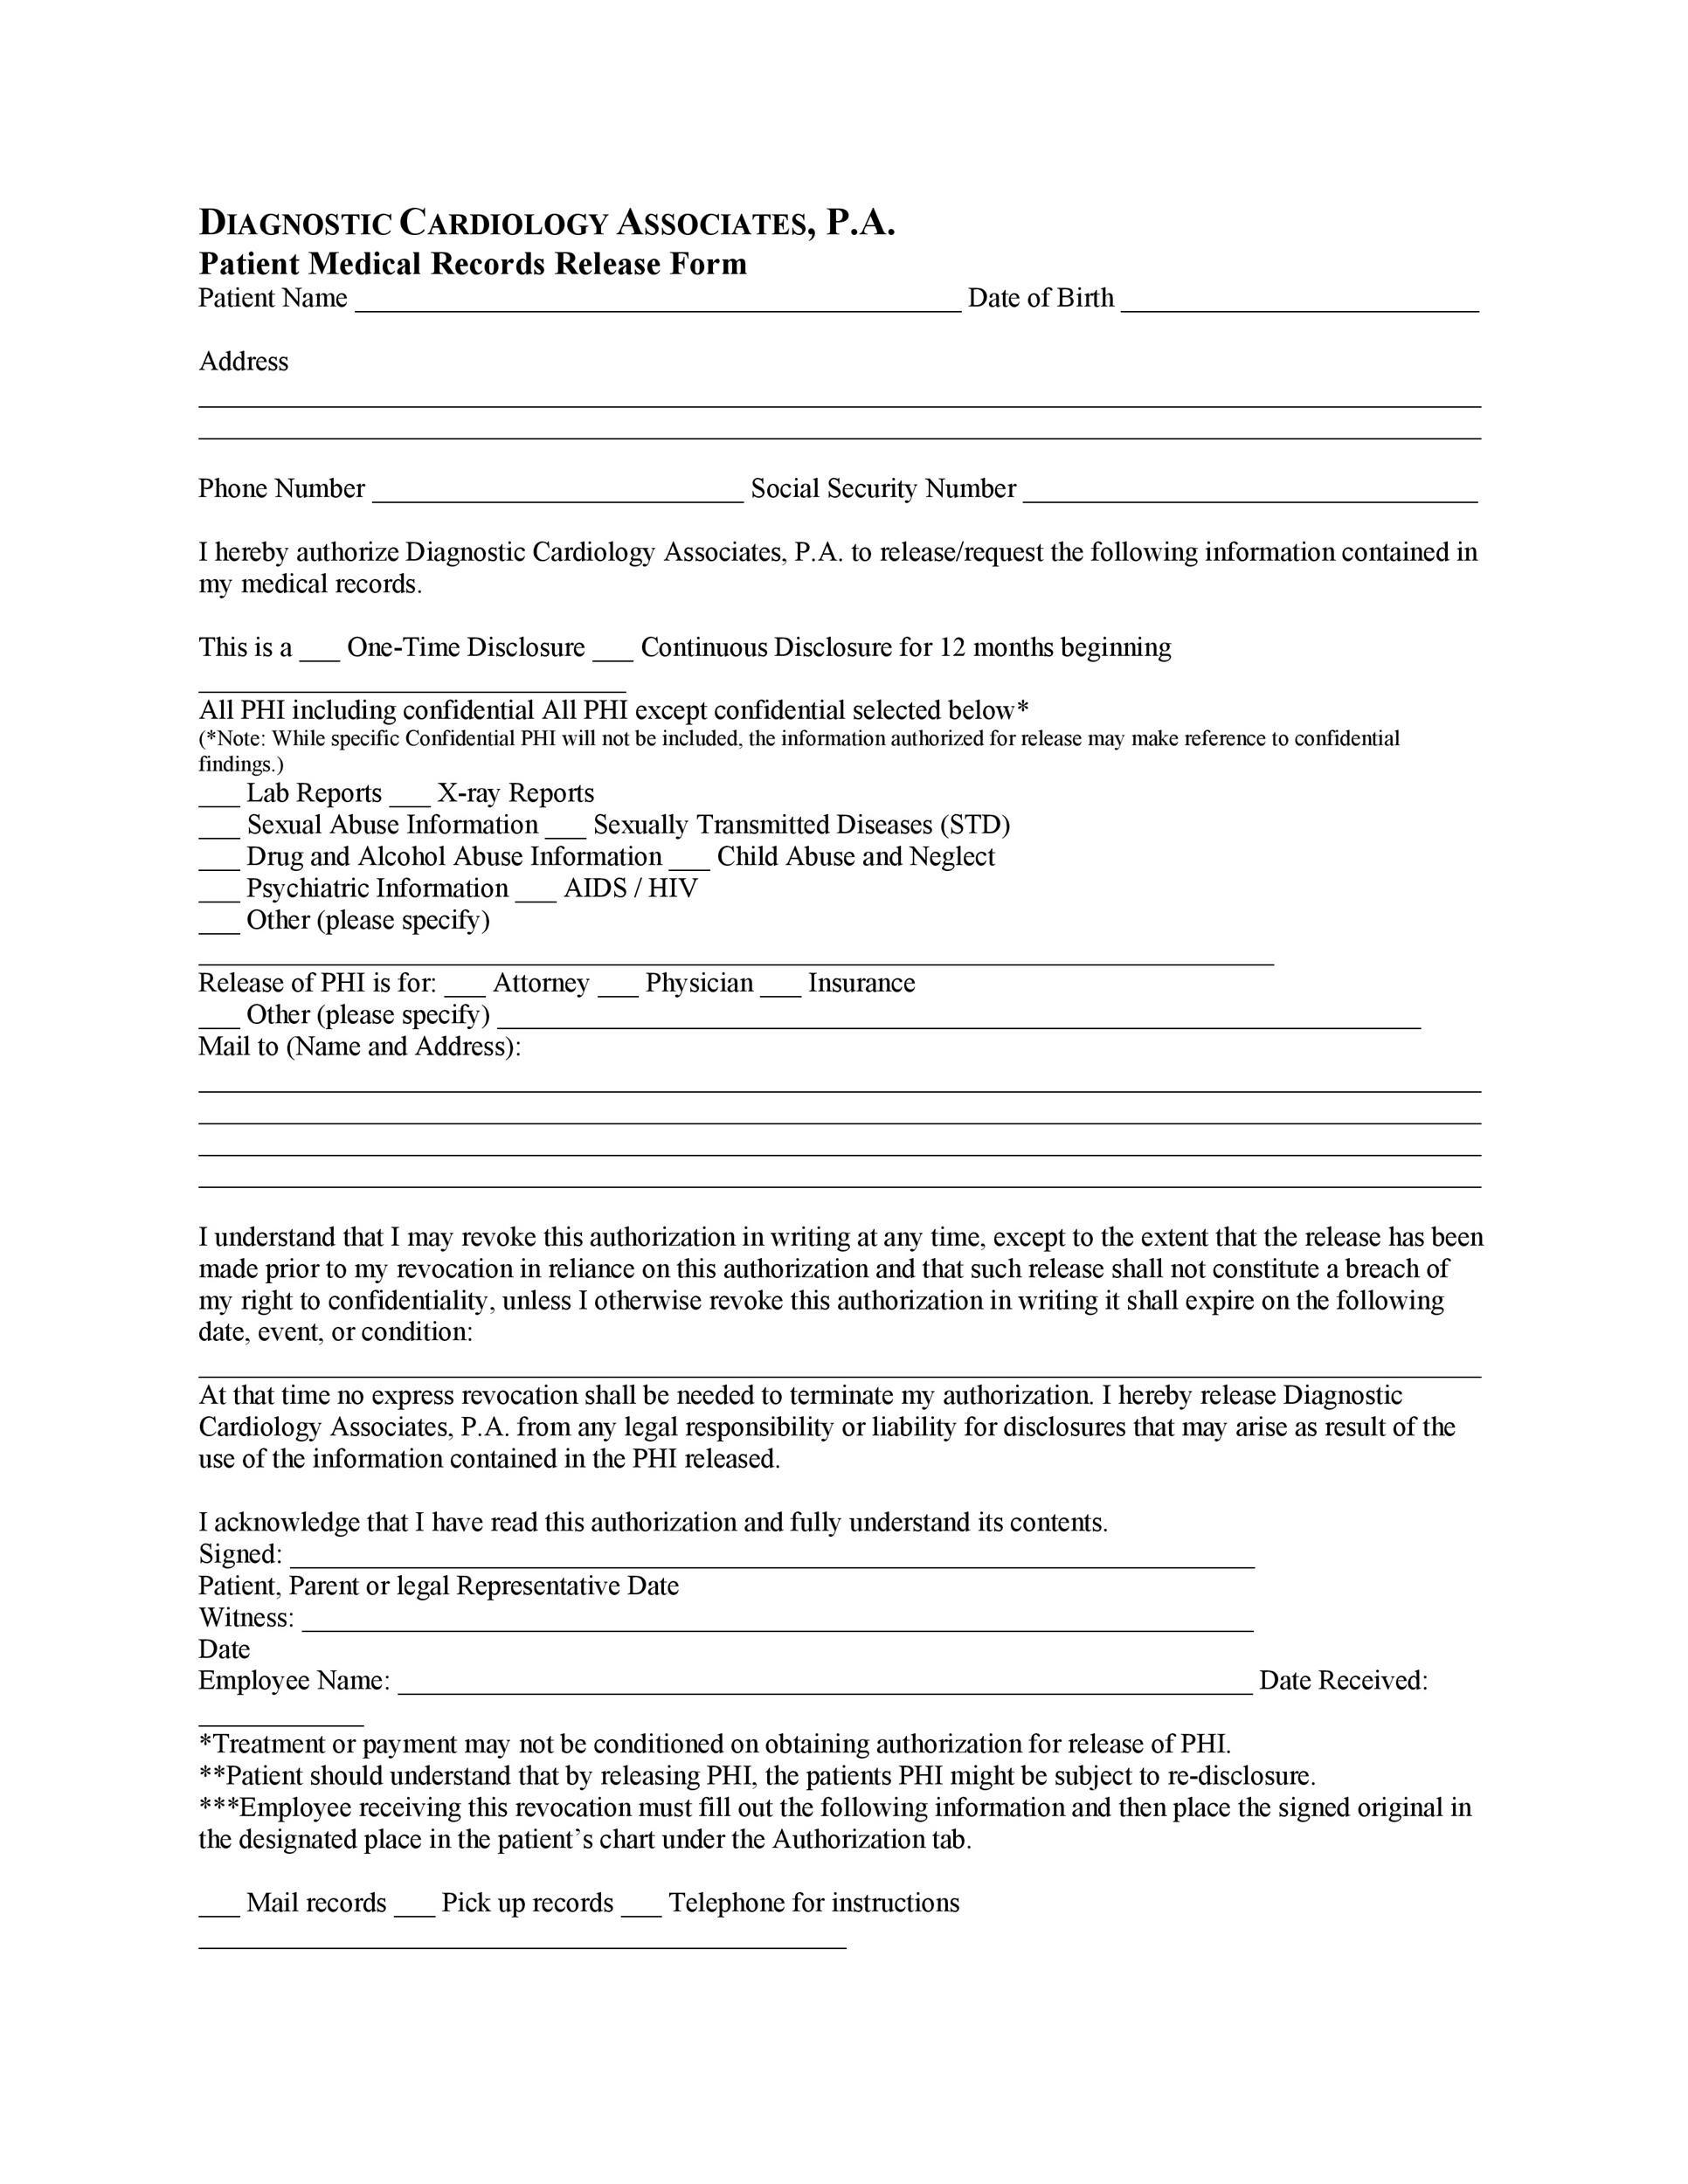 Medical Release Form Template 30 medical release form templates – Printable Medical Release Form for Children